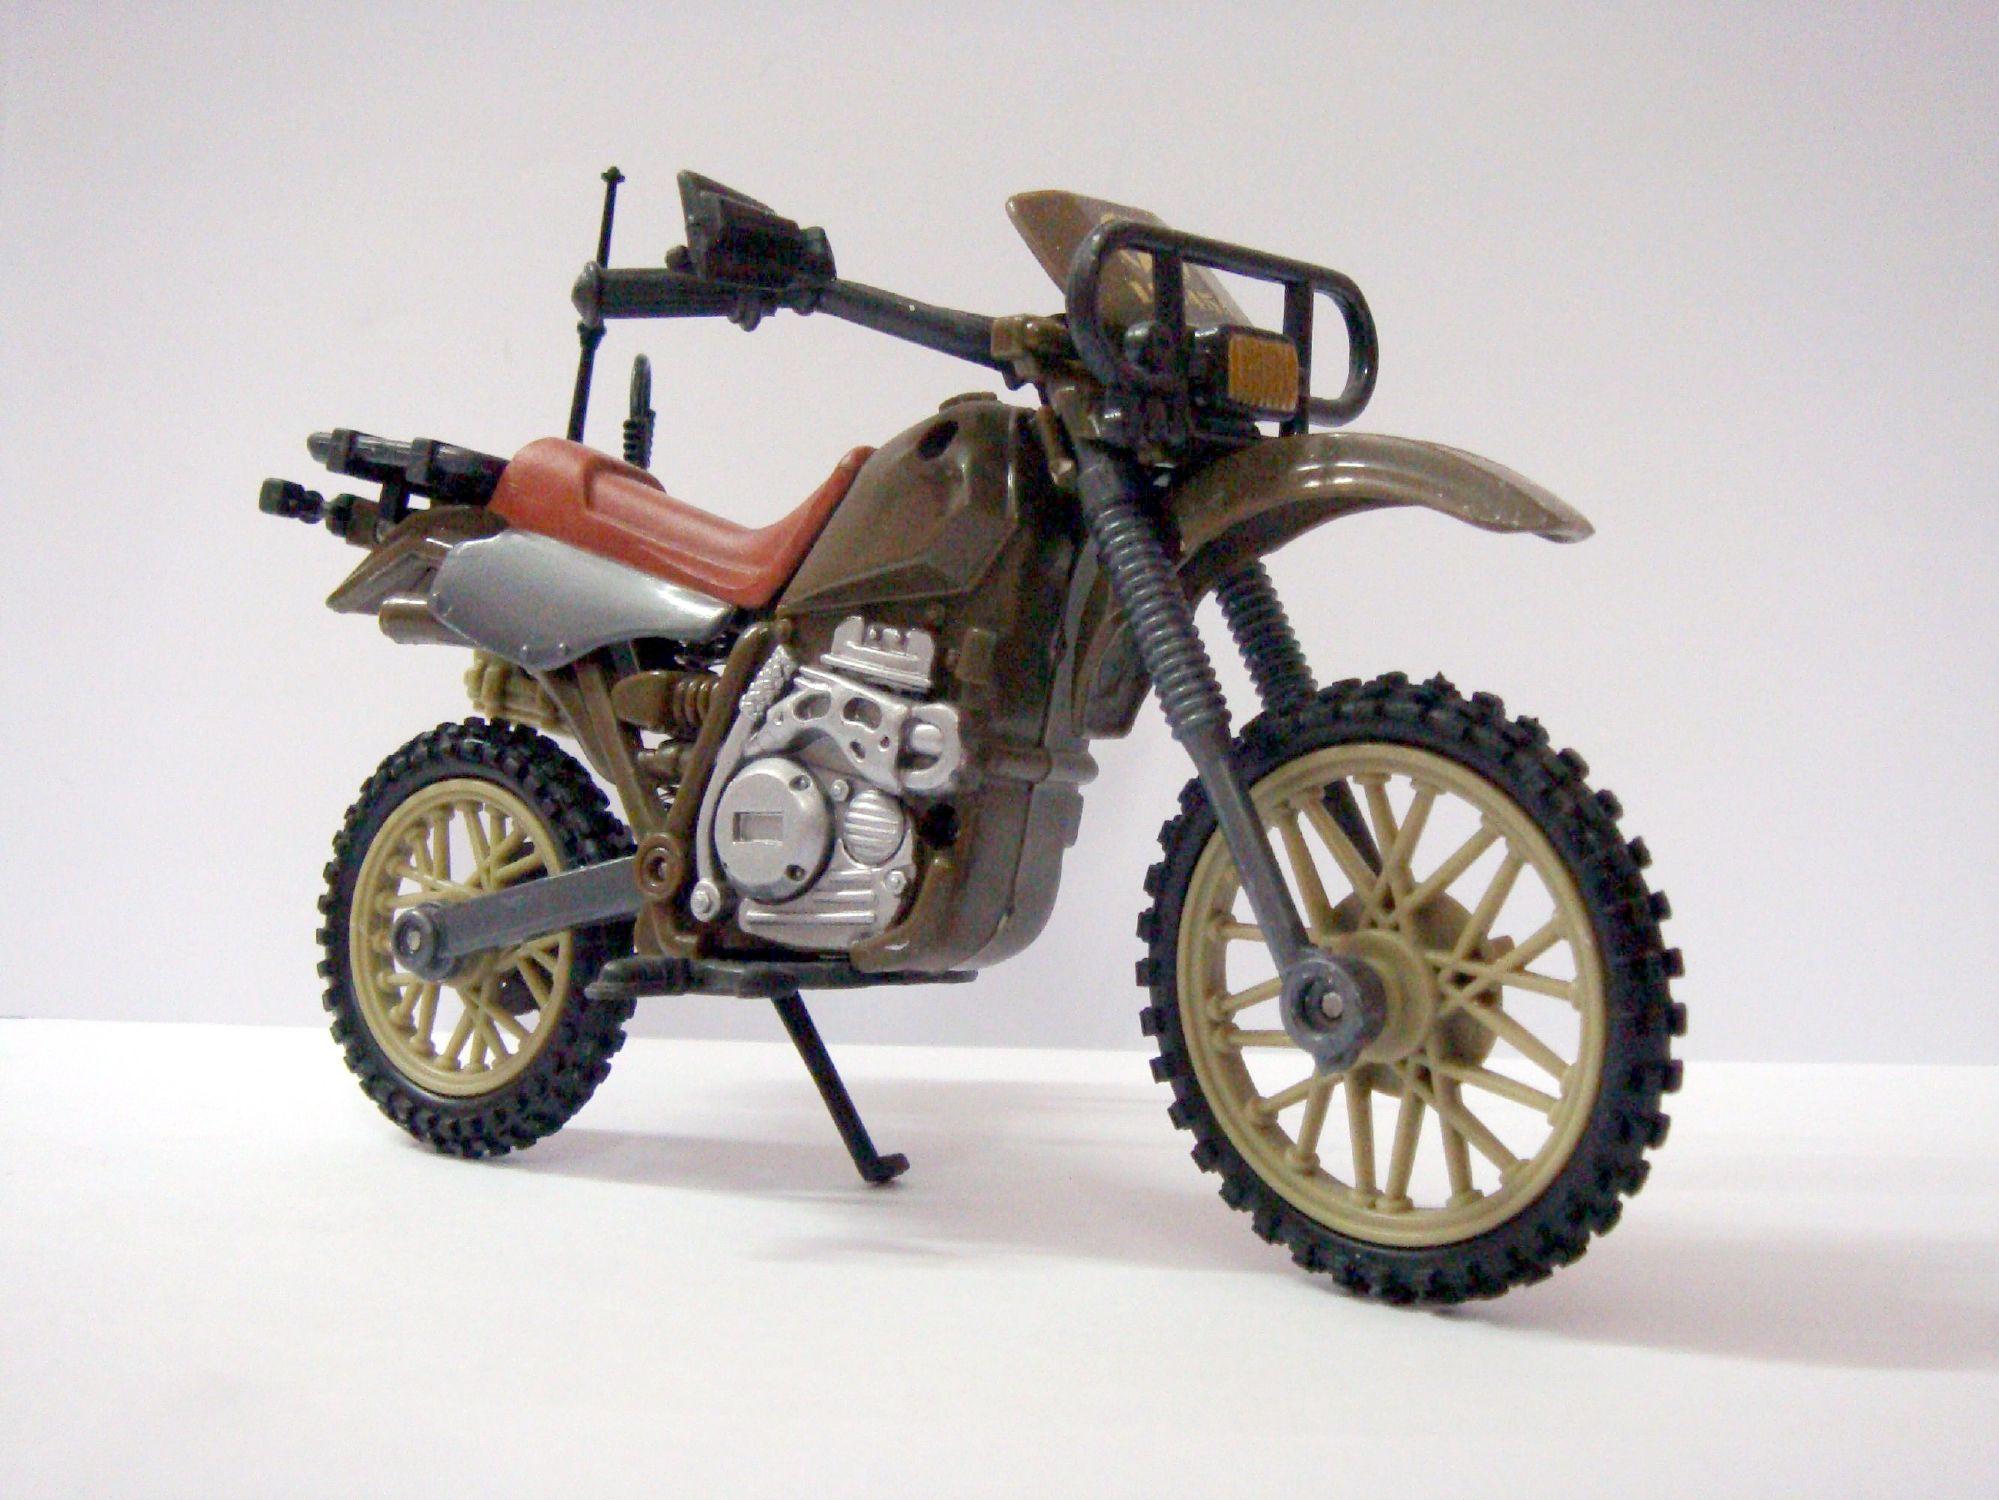 Bike, Crosser, Dirtbike, Miniature, Motorcycle, HQ Photo